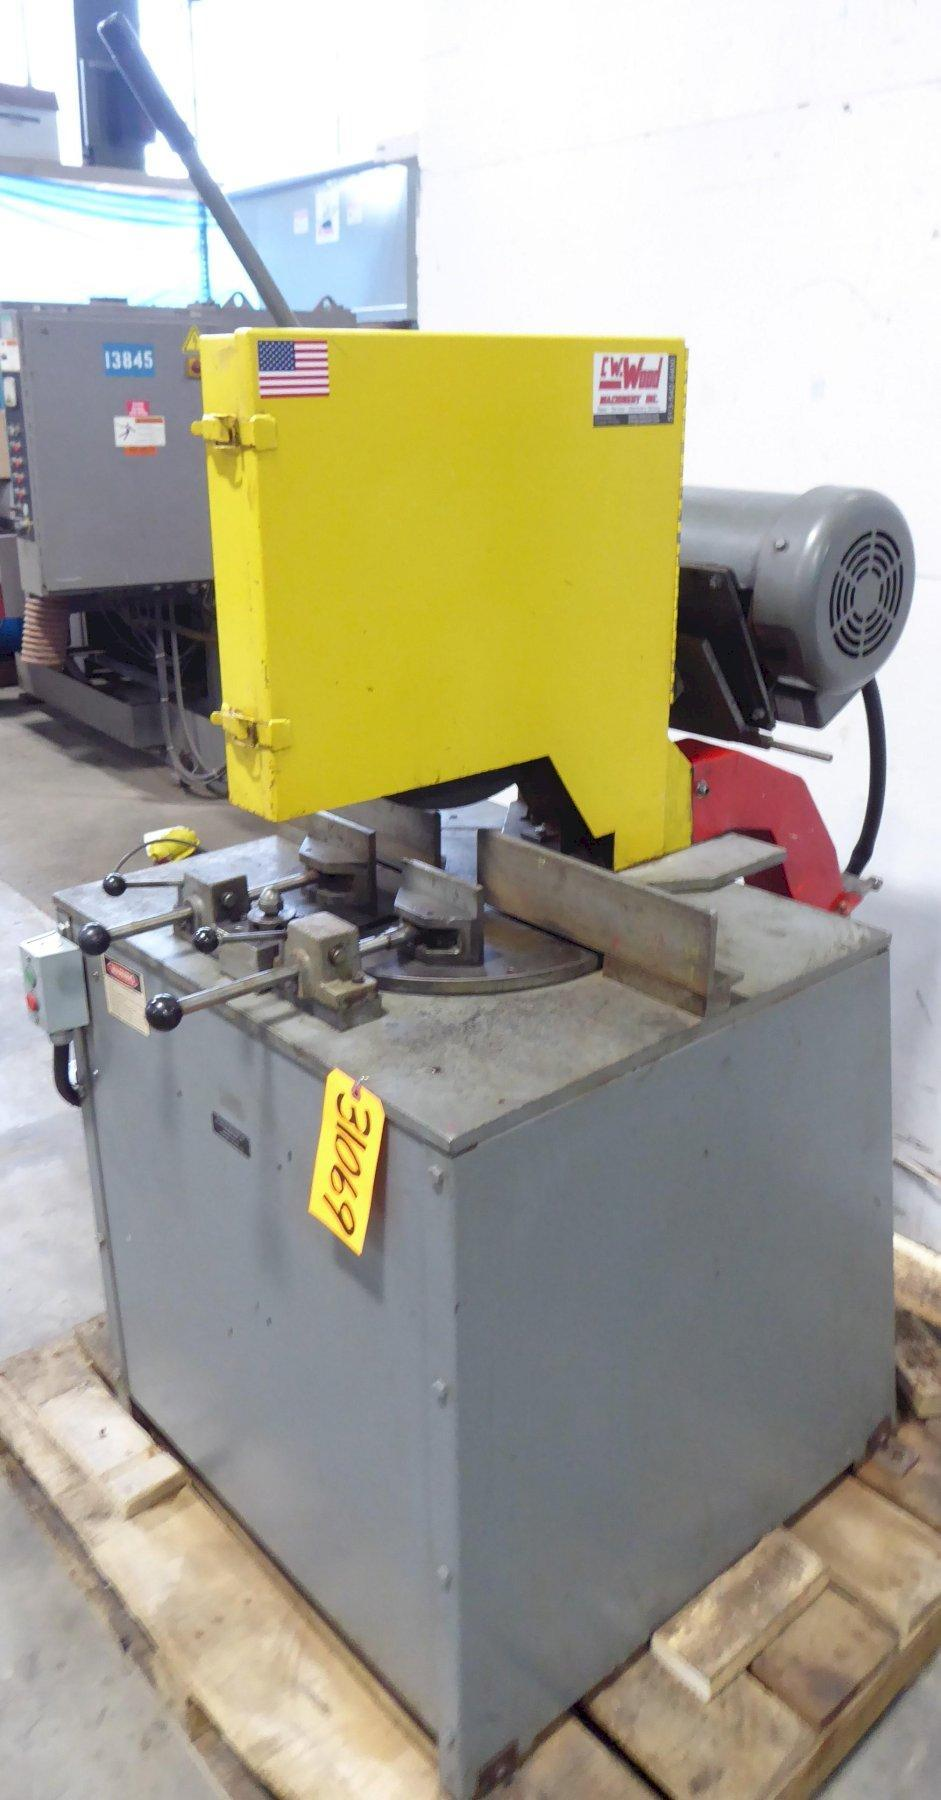 "16""/18"" Kalamazoo Abrasive Saw KM16-18, Miter, 3"" Solids, 10 HP"